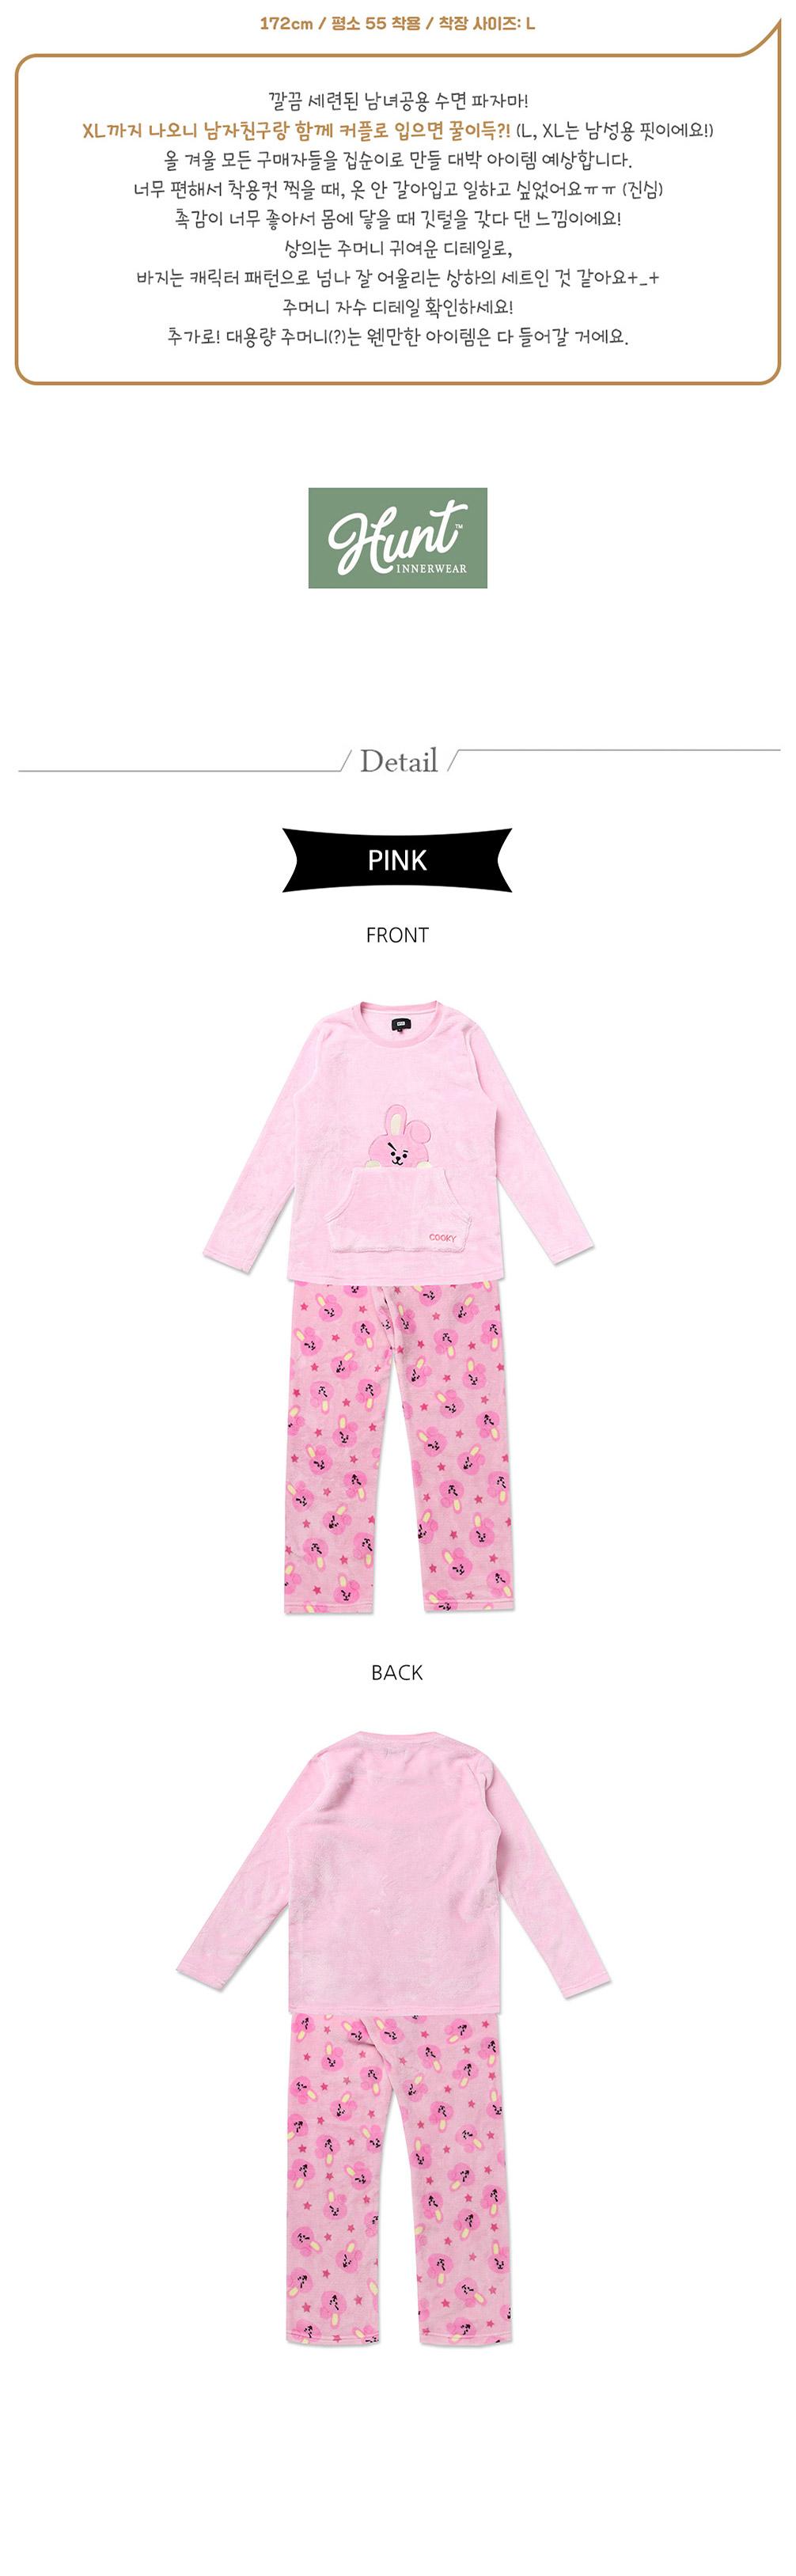 bt21_hunt_sleeping_pajama_02.jpg